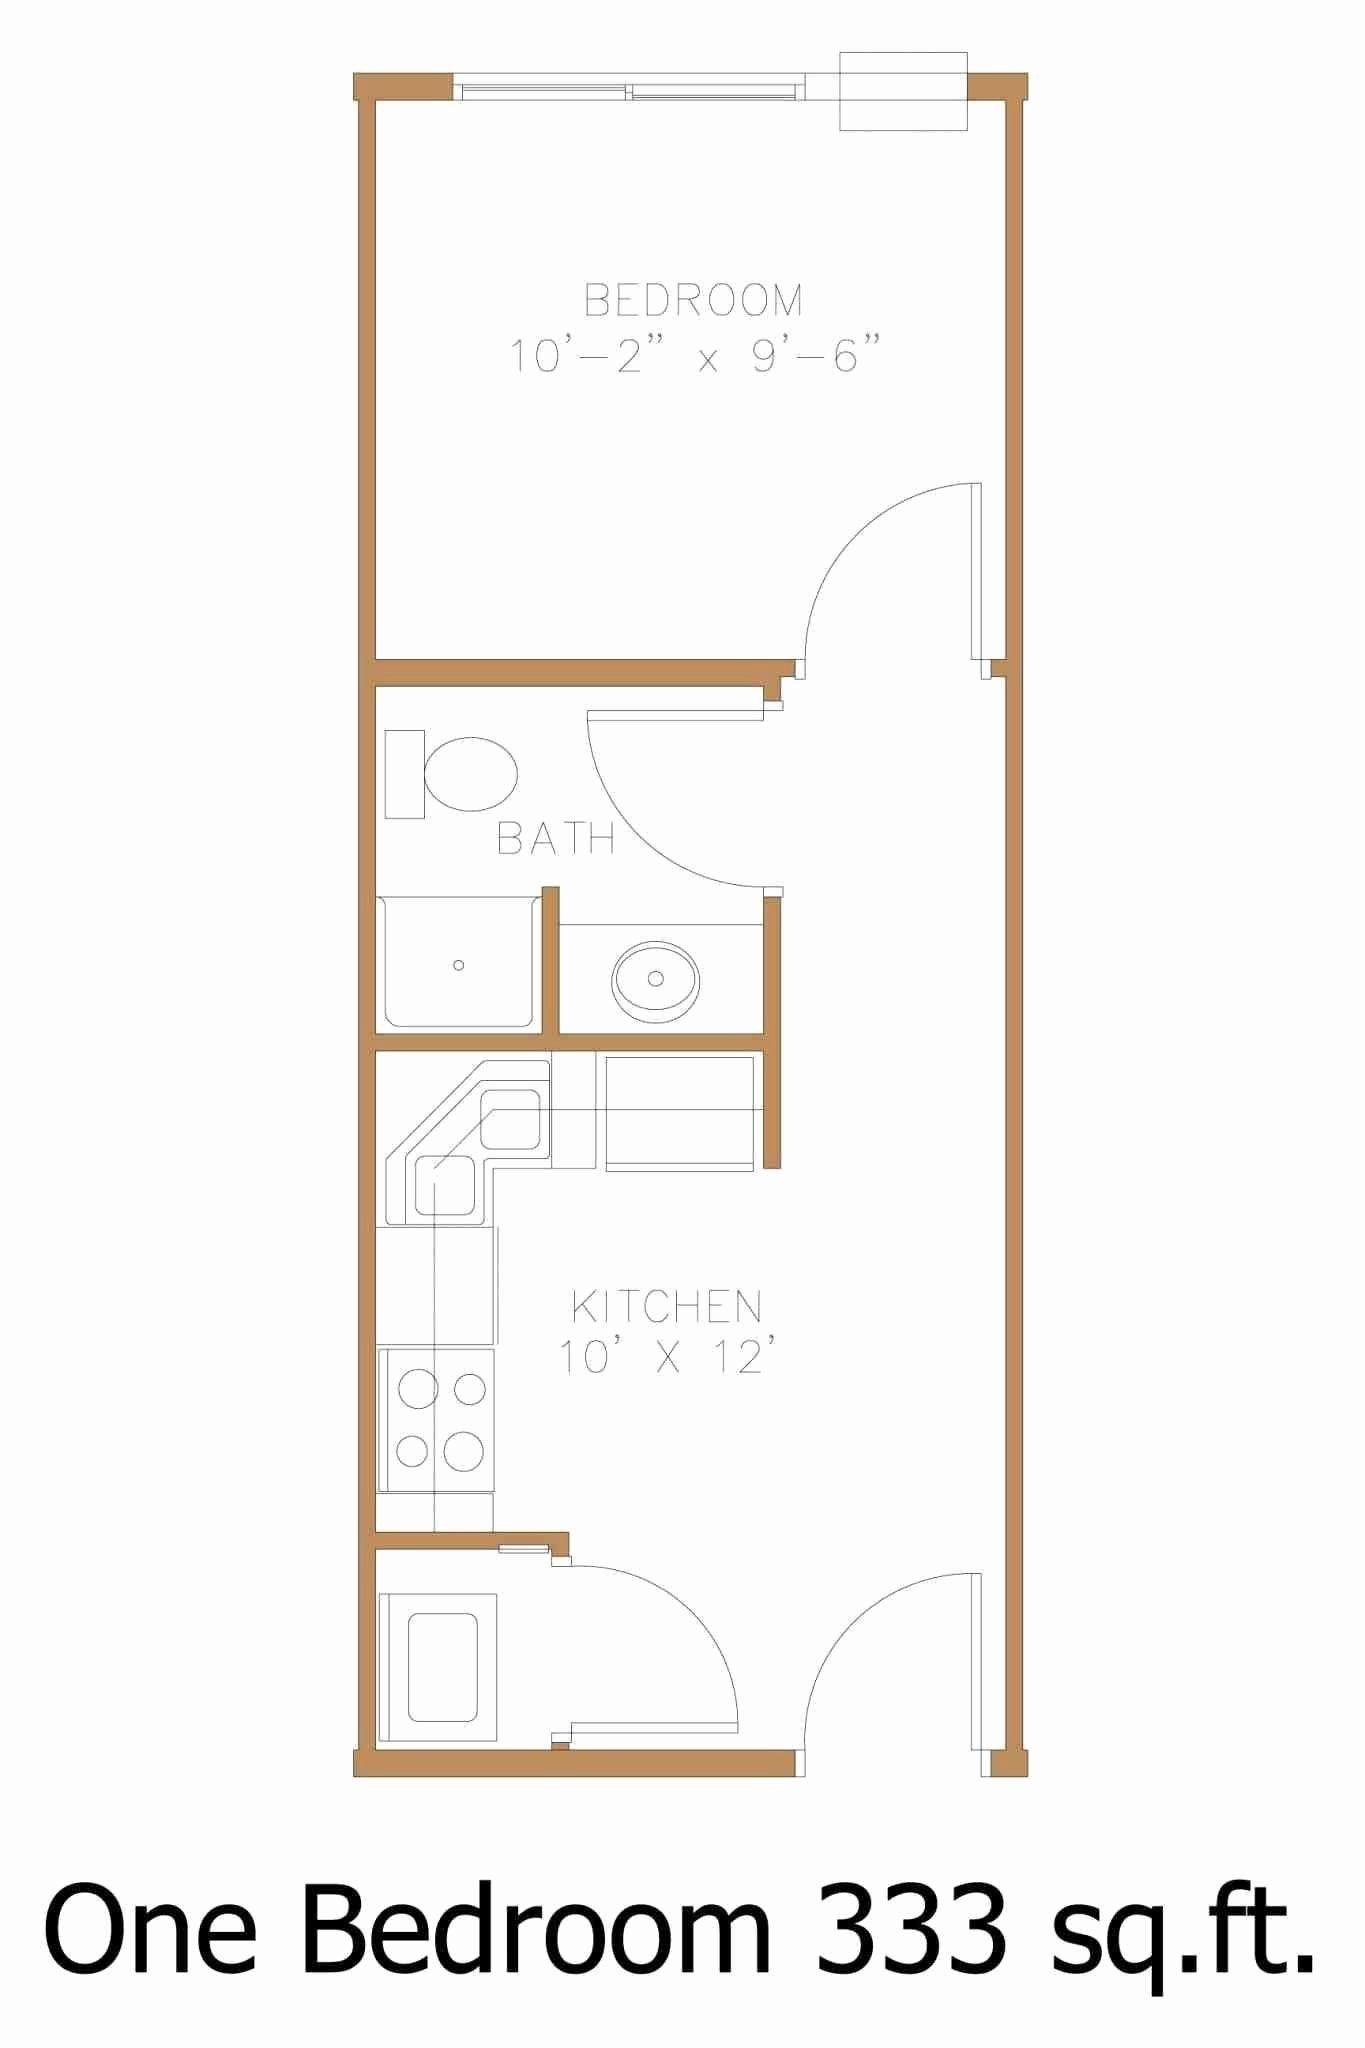 Simple One Bedroom House Plans New Simple Apartment Floor Plan Sensational Cheap Apartment One Bedroom House Plans Bathroom Floor Plans Bedroom House Plans